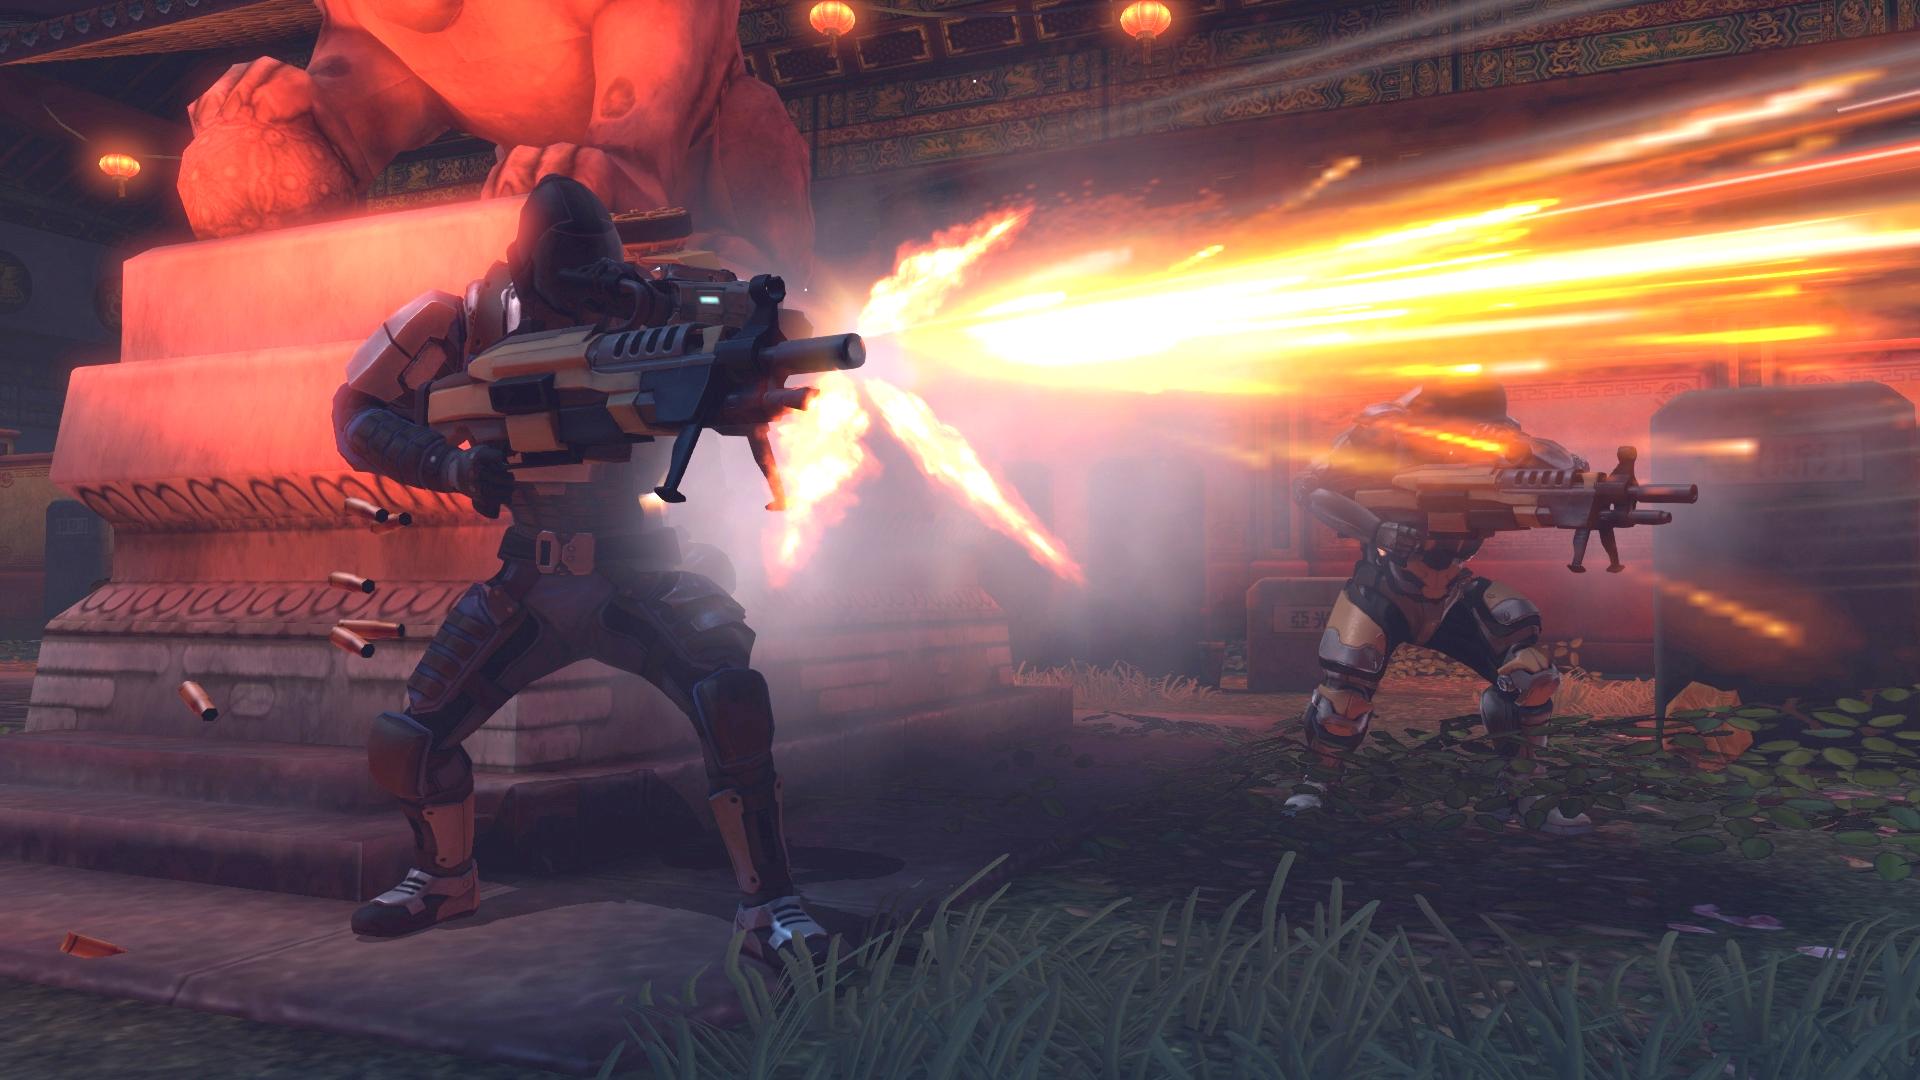 XCOM's Slingshot DLC hits Tuesday for $6 99 - Polygon